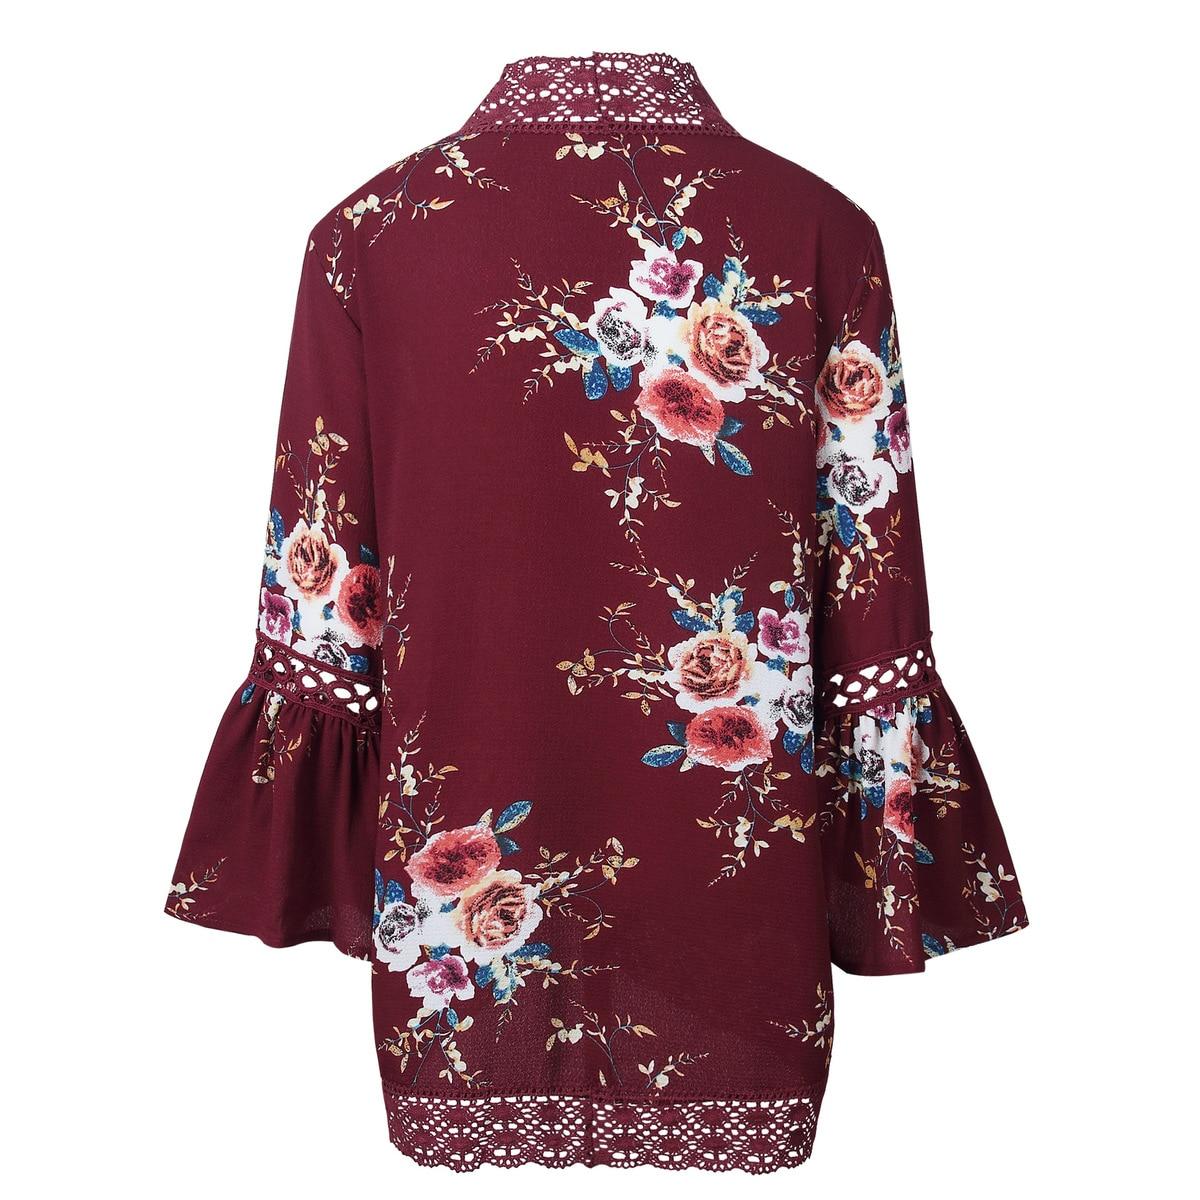 HTB1kWr.kIIrBKNjSZK9q6ygoVXaz Women Plus Size Loose Casual Basic Jackets Female 2018 Autumn Long Flare Sleeve Floral Print Outwear Coat Open Stitch Clothing